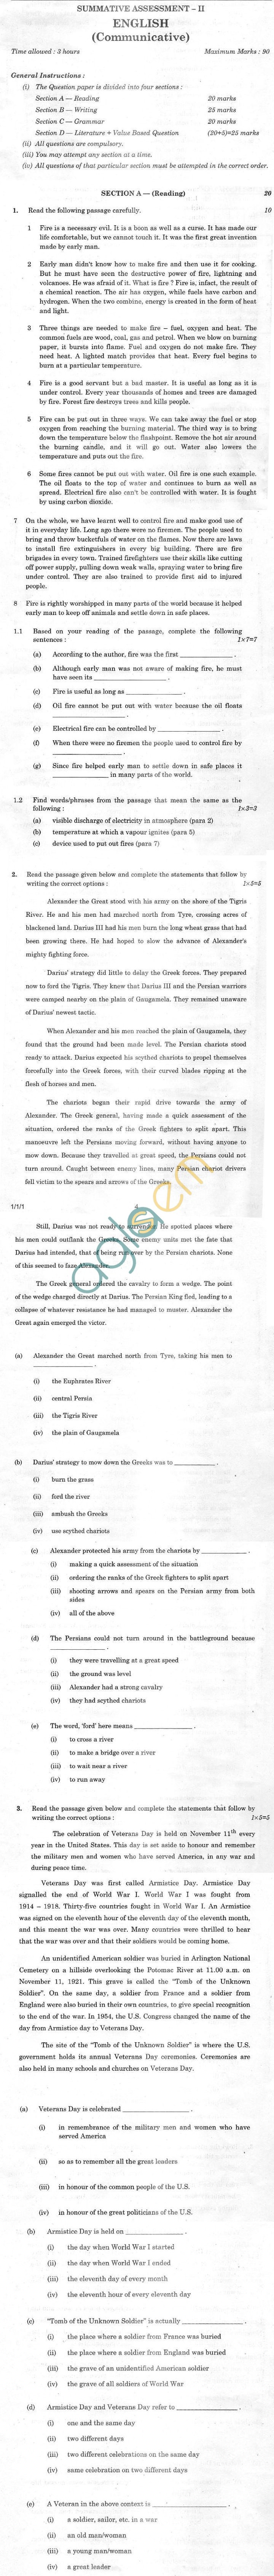 CBSE Board Exam Class 10 SA2 Sample Question Paper –English Communicative